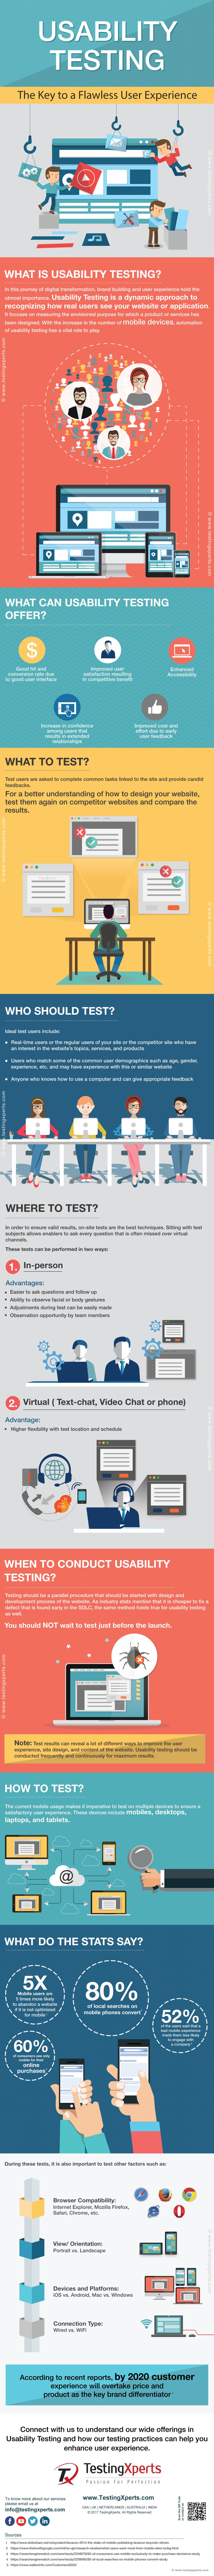 usability-testing02